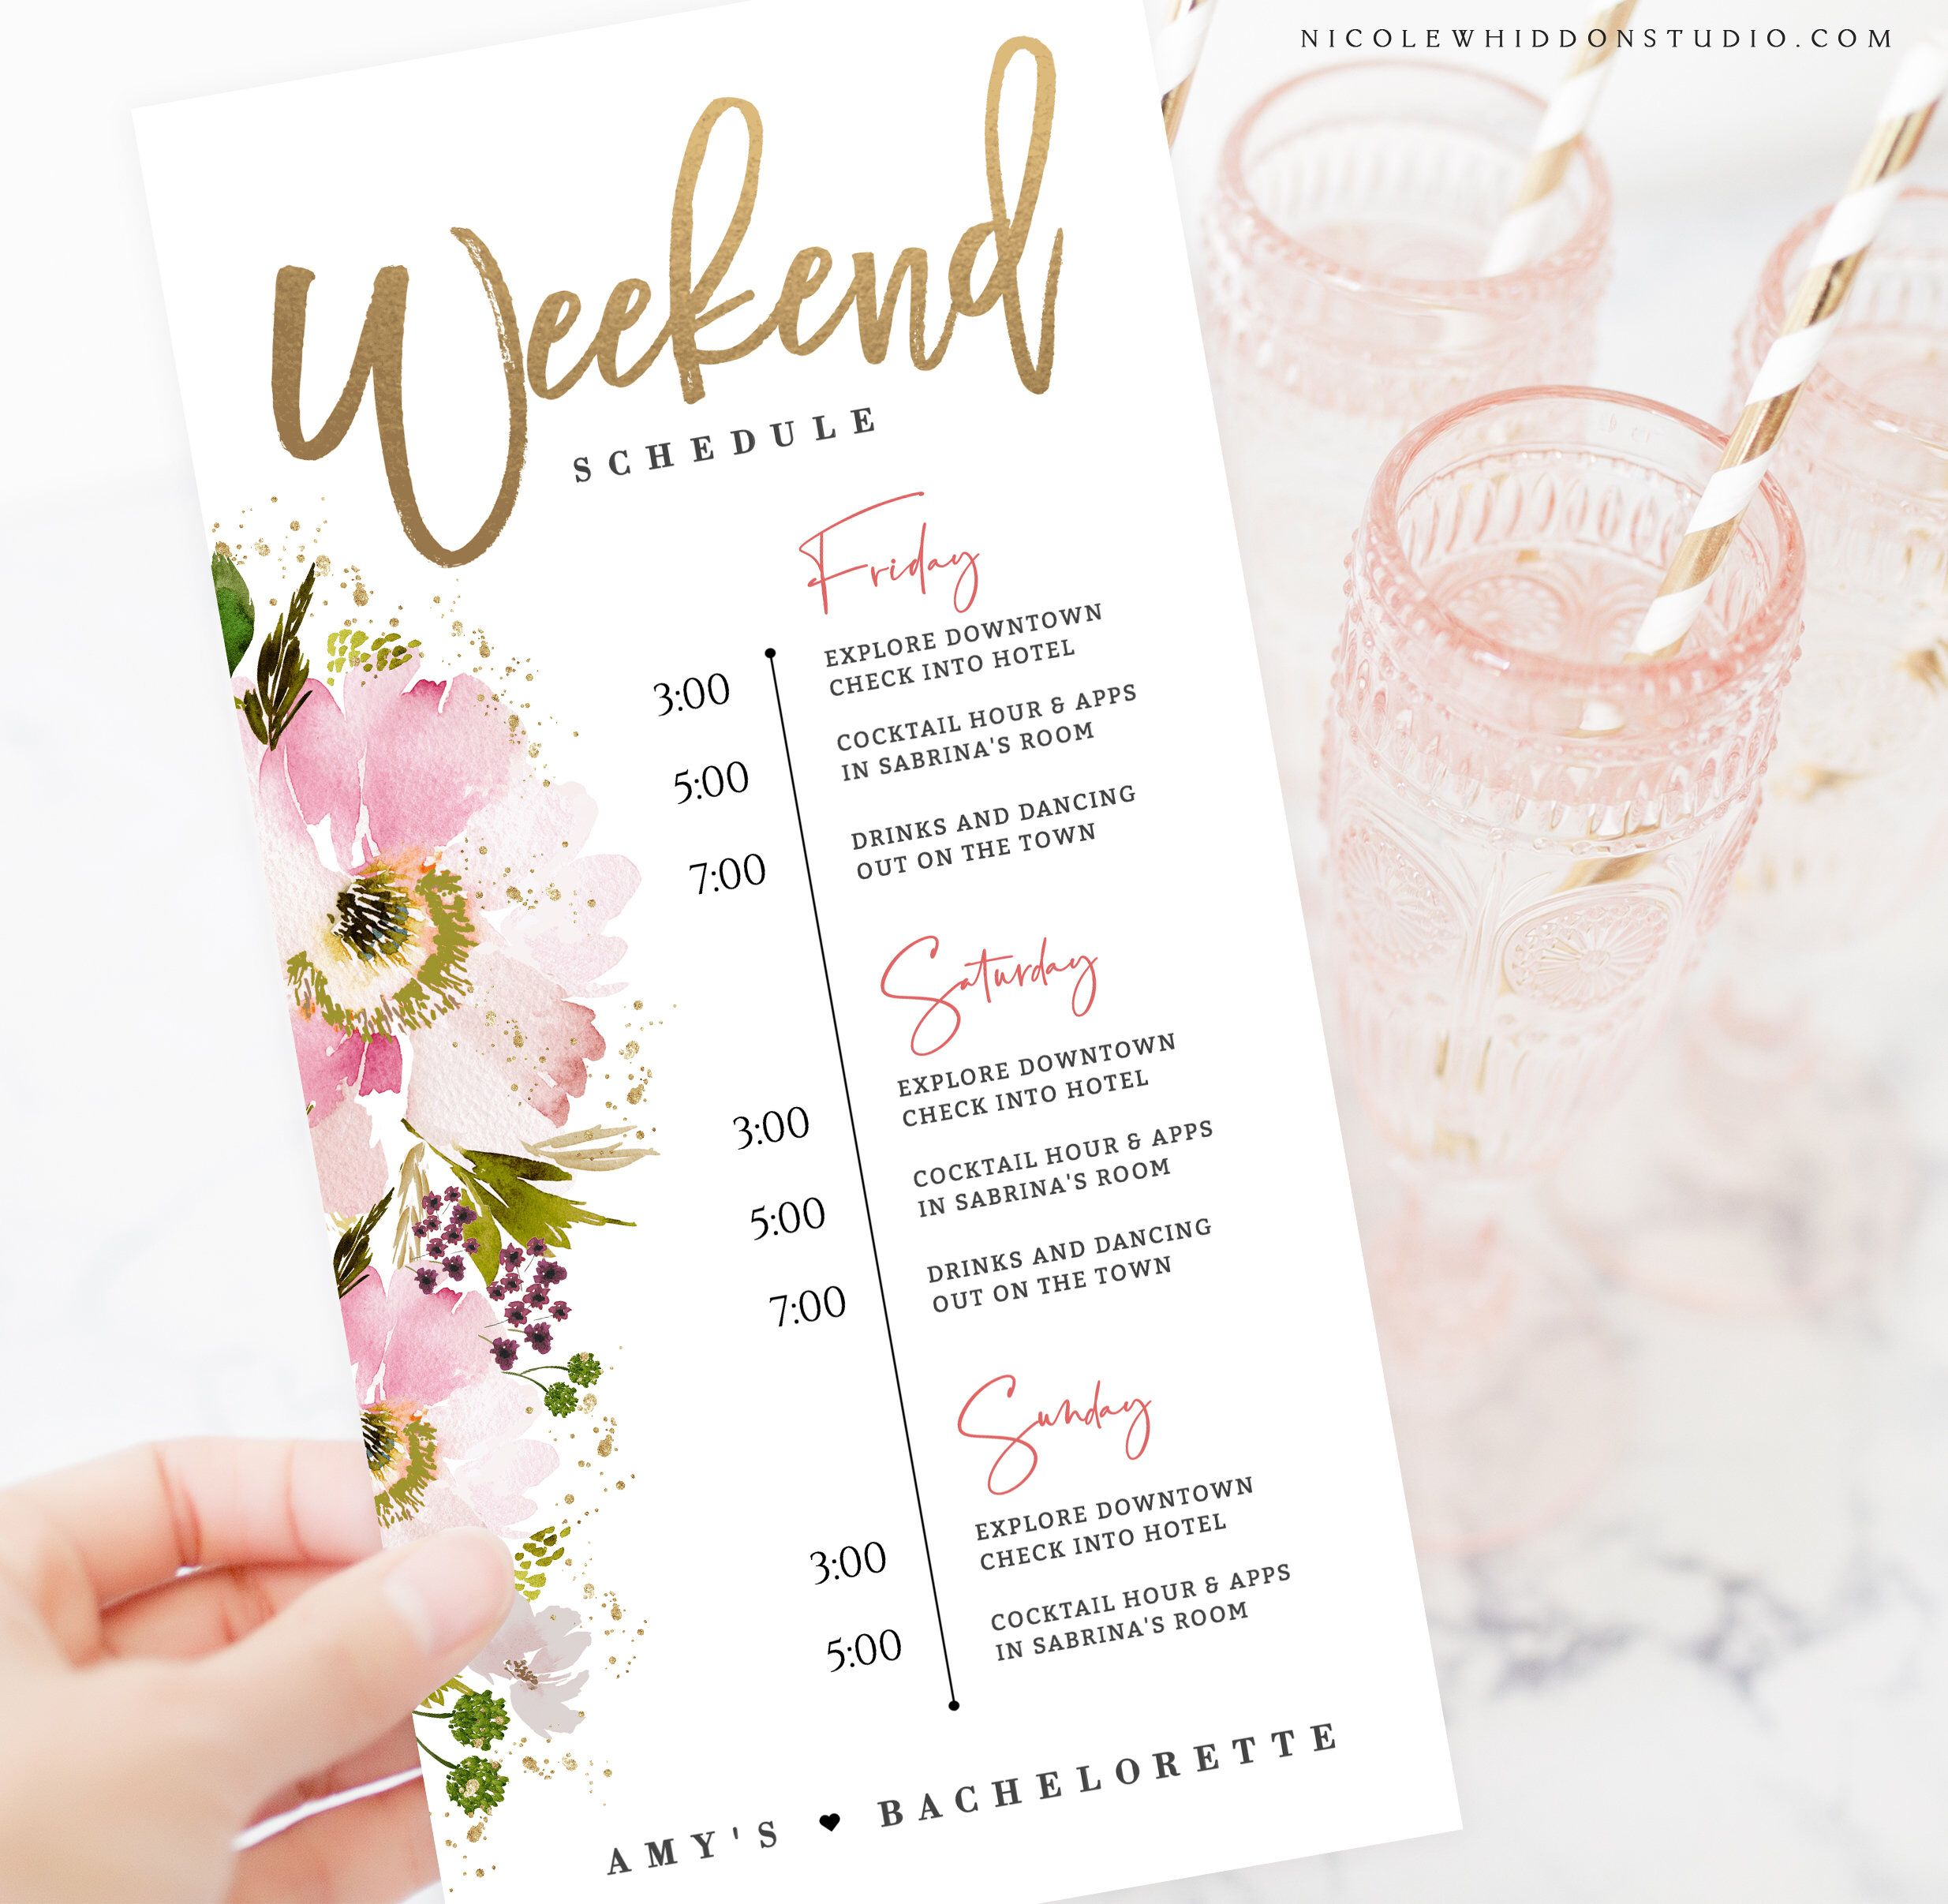 Bachelorette Weekend Itinerary Editable Template Wedding Etsy In 2021 Bachelorette Weekend Itinerary Bachelorette Invitations Wedding Order Of Events